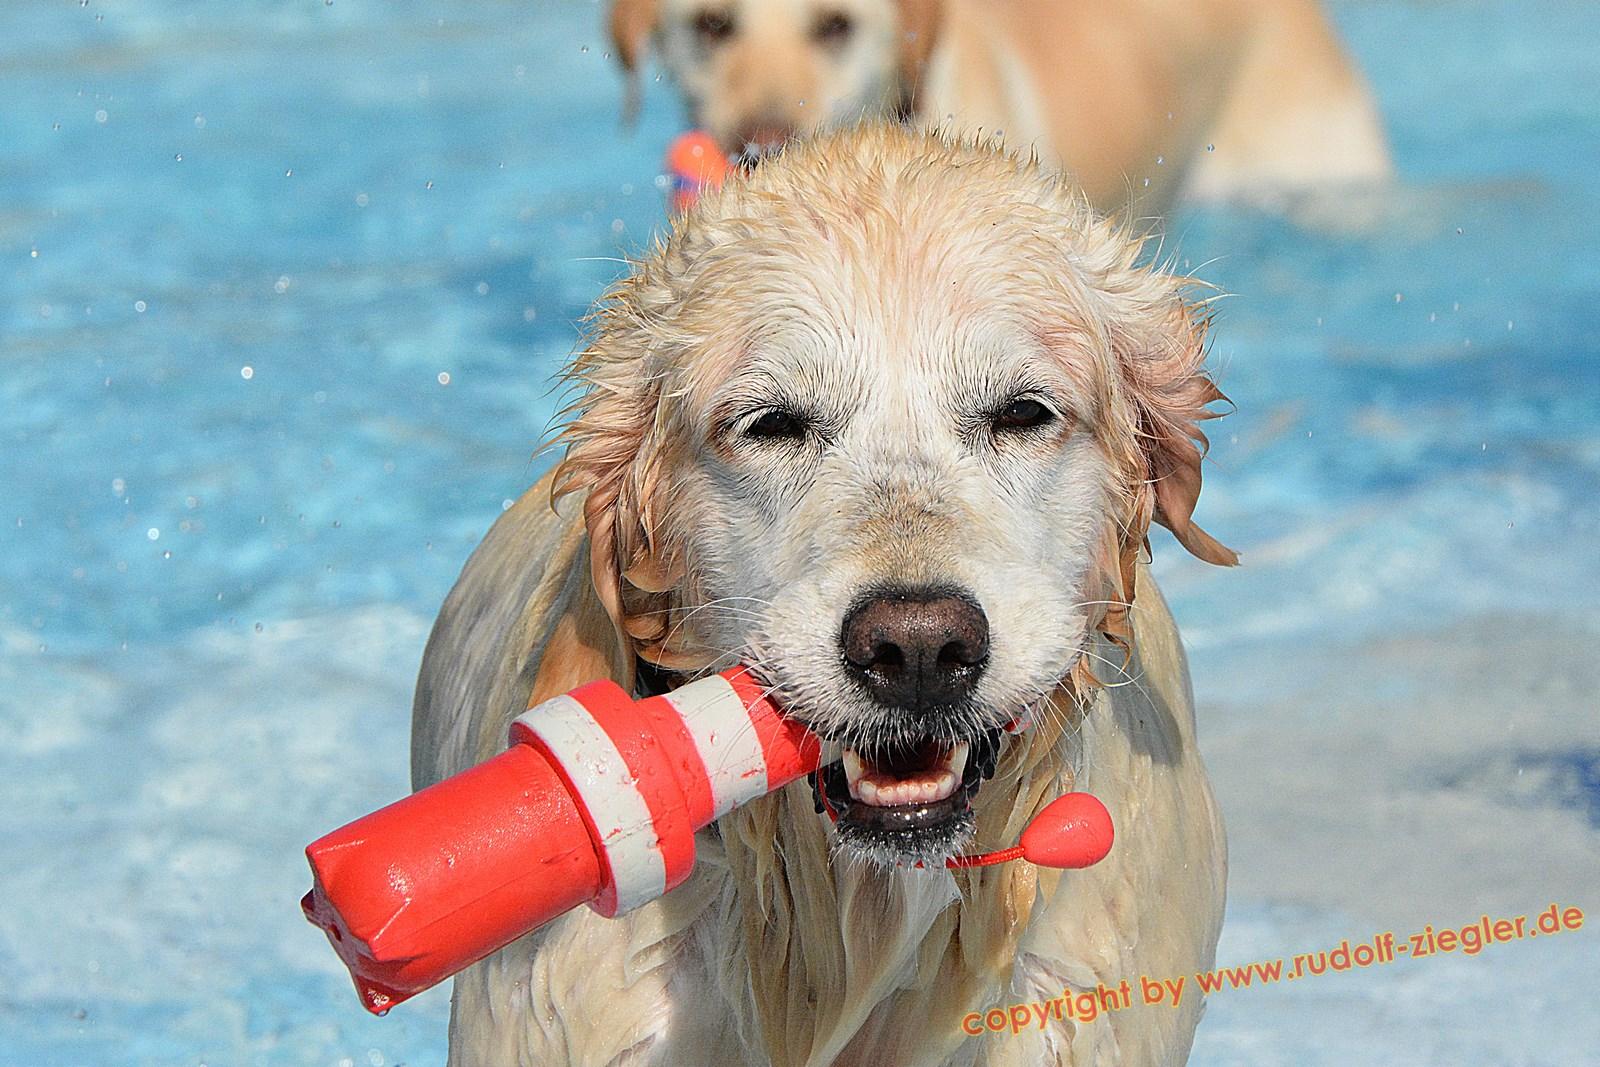 Hundebadetag im Kreuzsteinbad 2016 035-A-S (1600x1200)